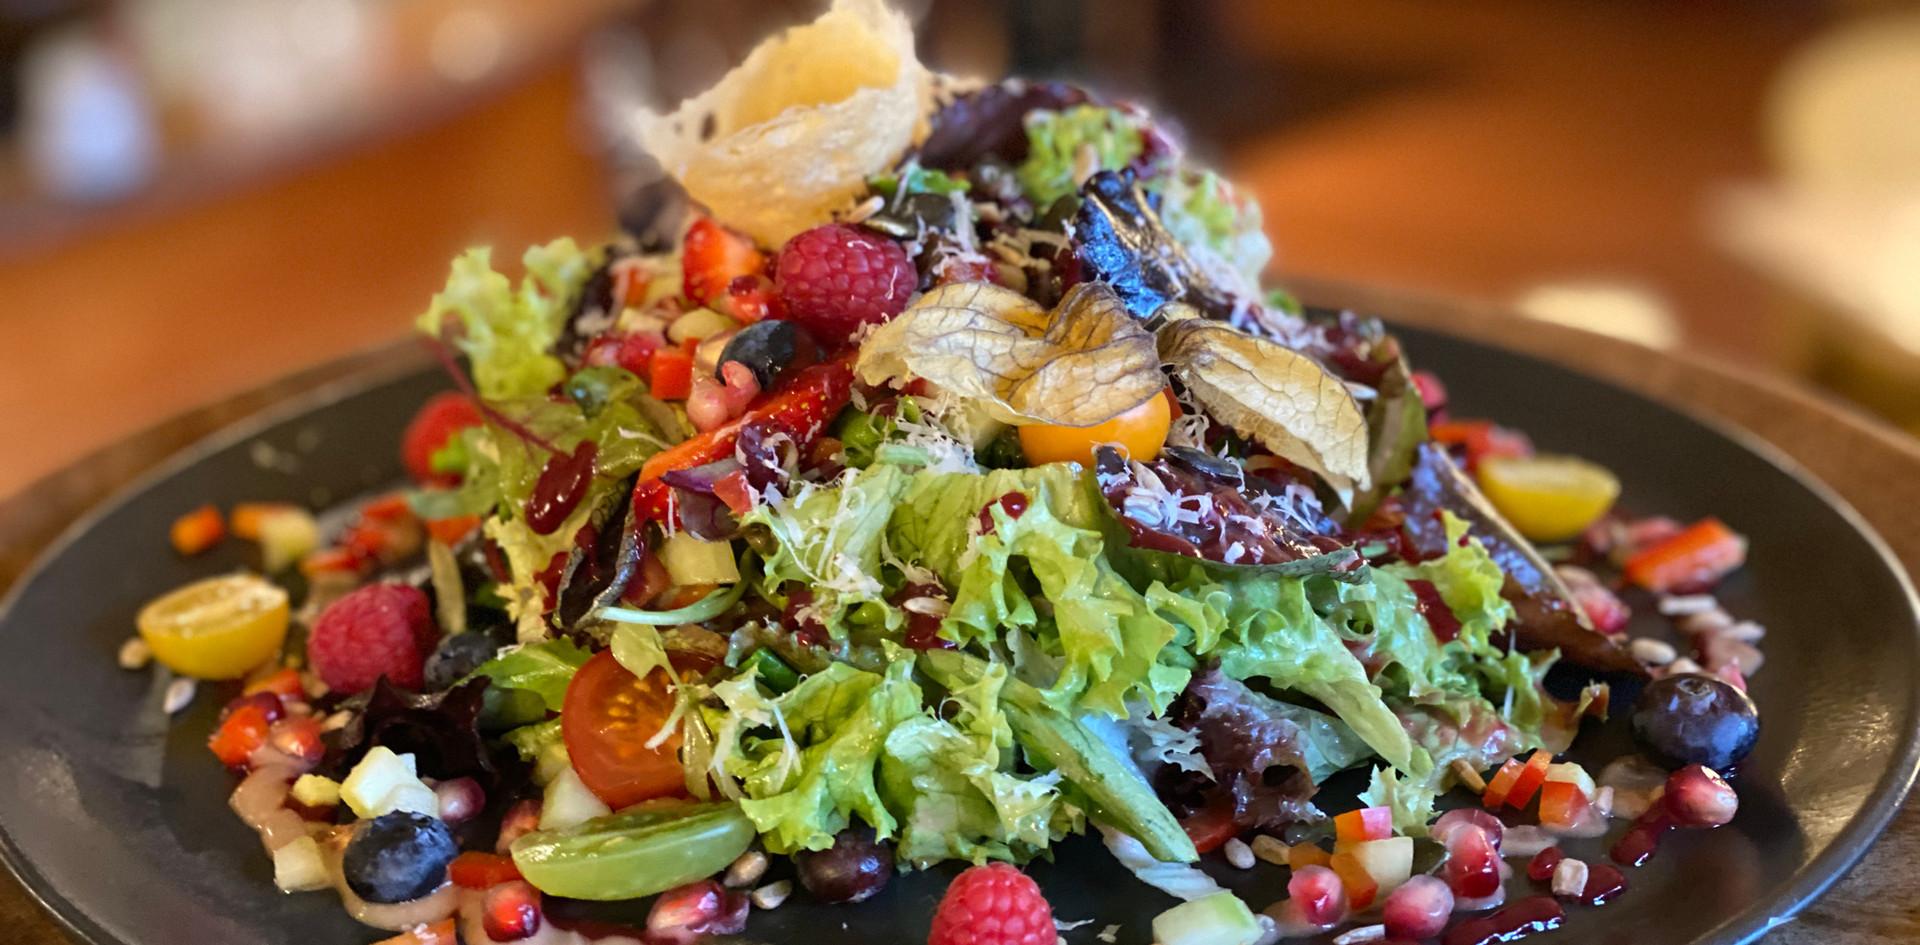 großer Salat Restaurant Dinner - Hotel Wegner - The culinary Art Hotel